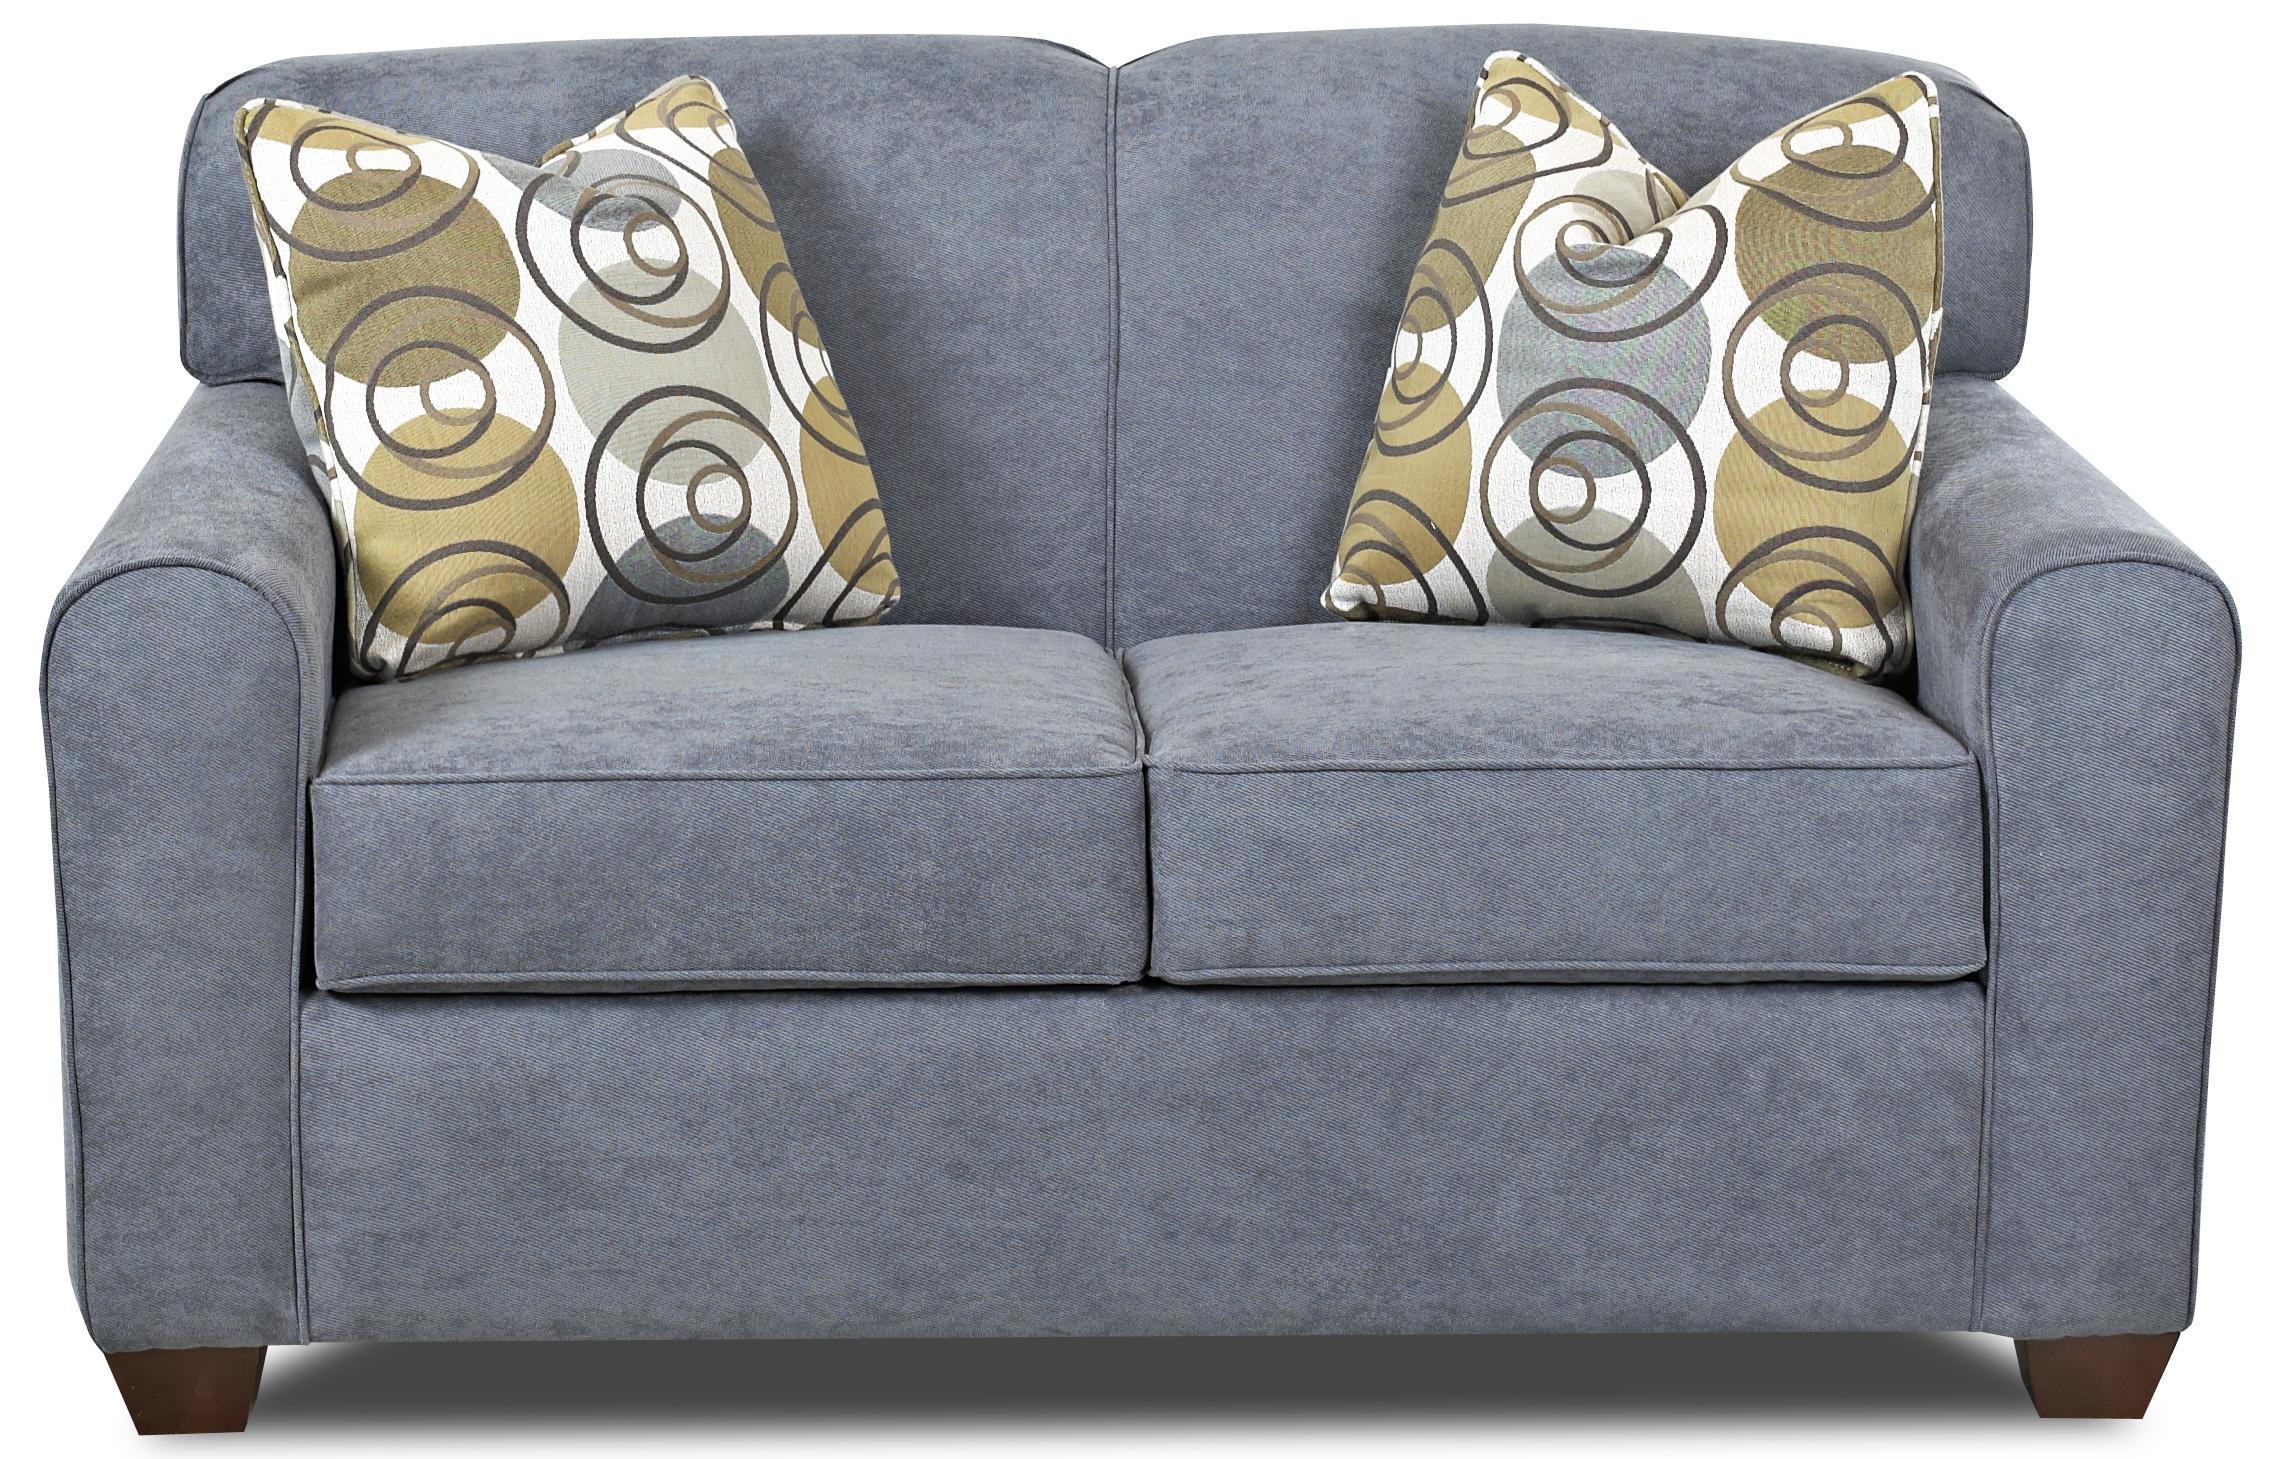 Klaussner Zuma Dreamquest Twin Sleeper Lagniappe Home Store Sleeper Sofas